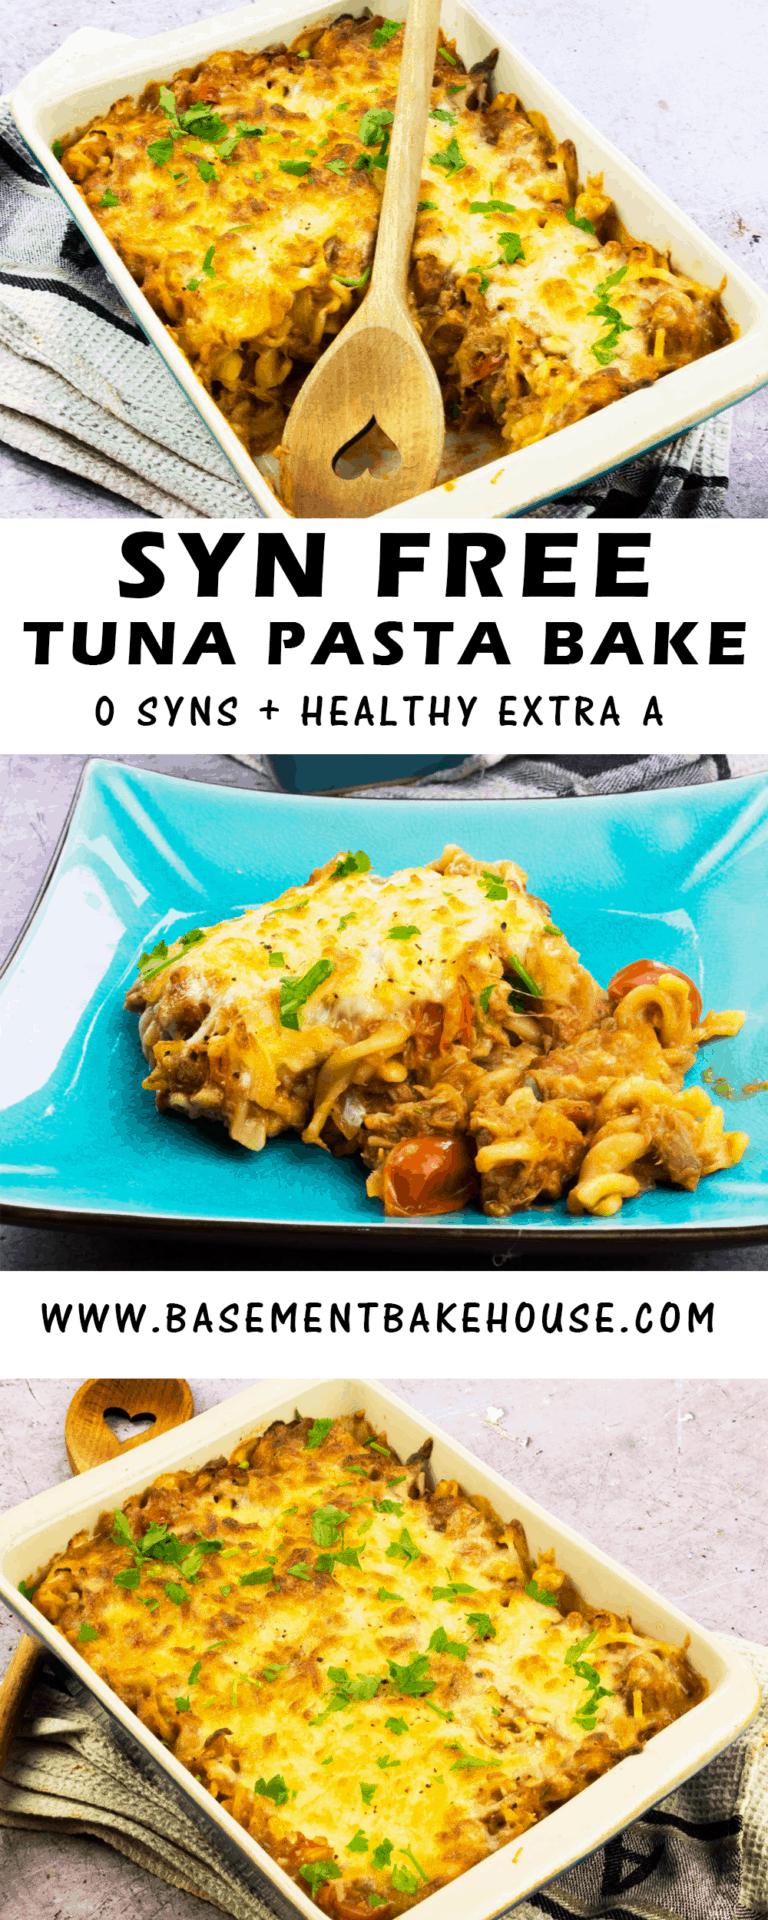 Best Ever Syn Free Tuna Pasta Bake #simplehealthydinner